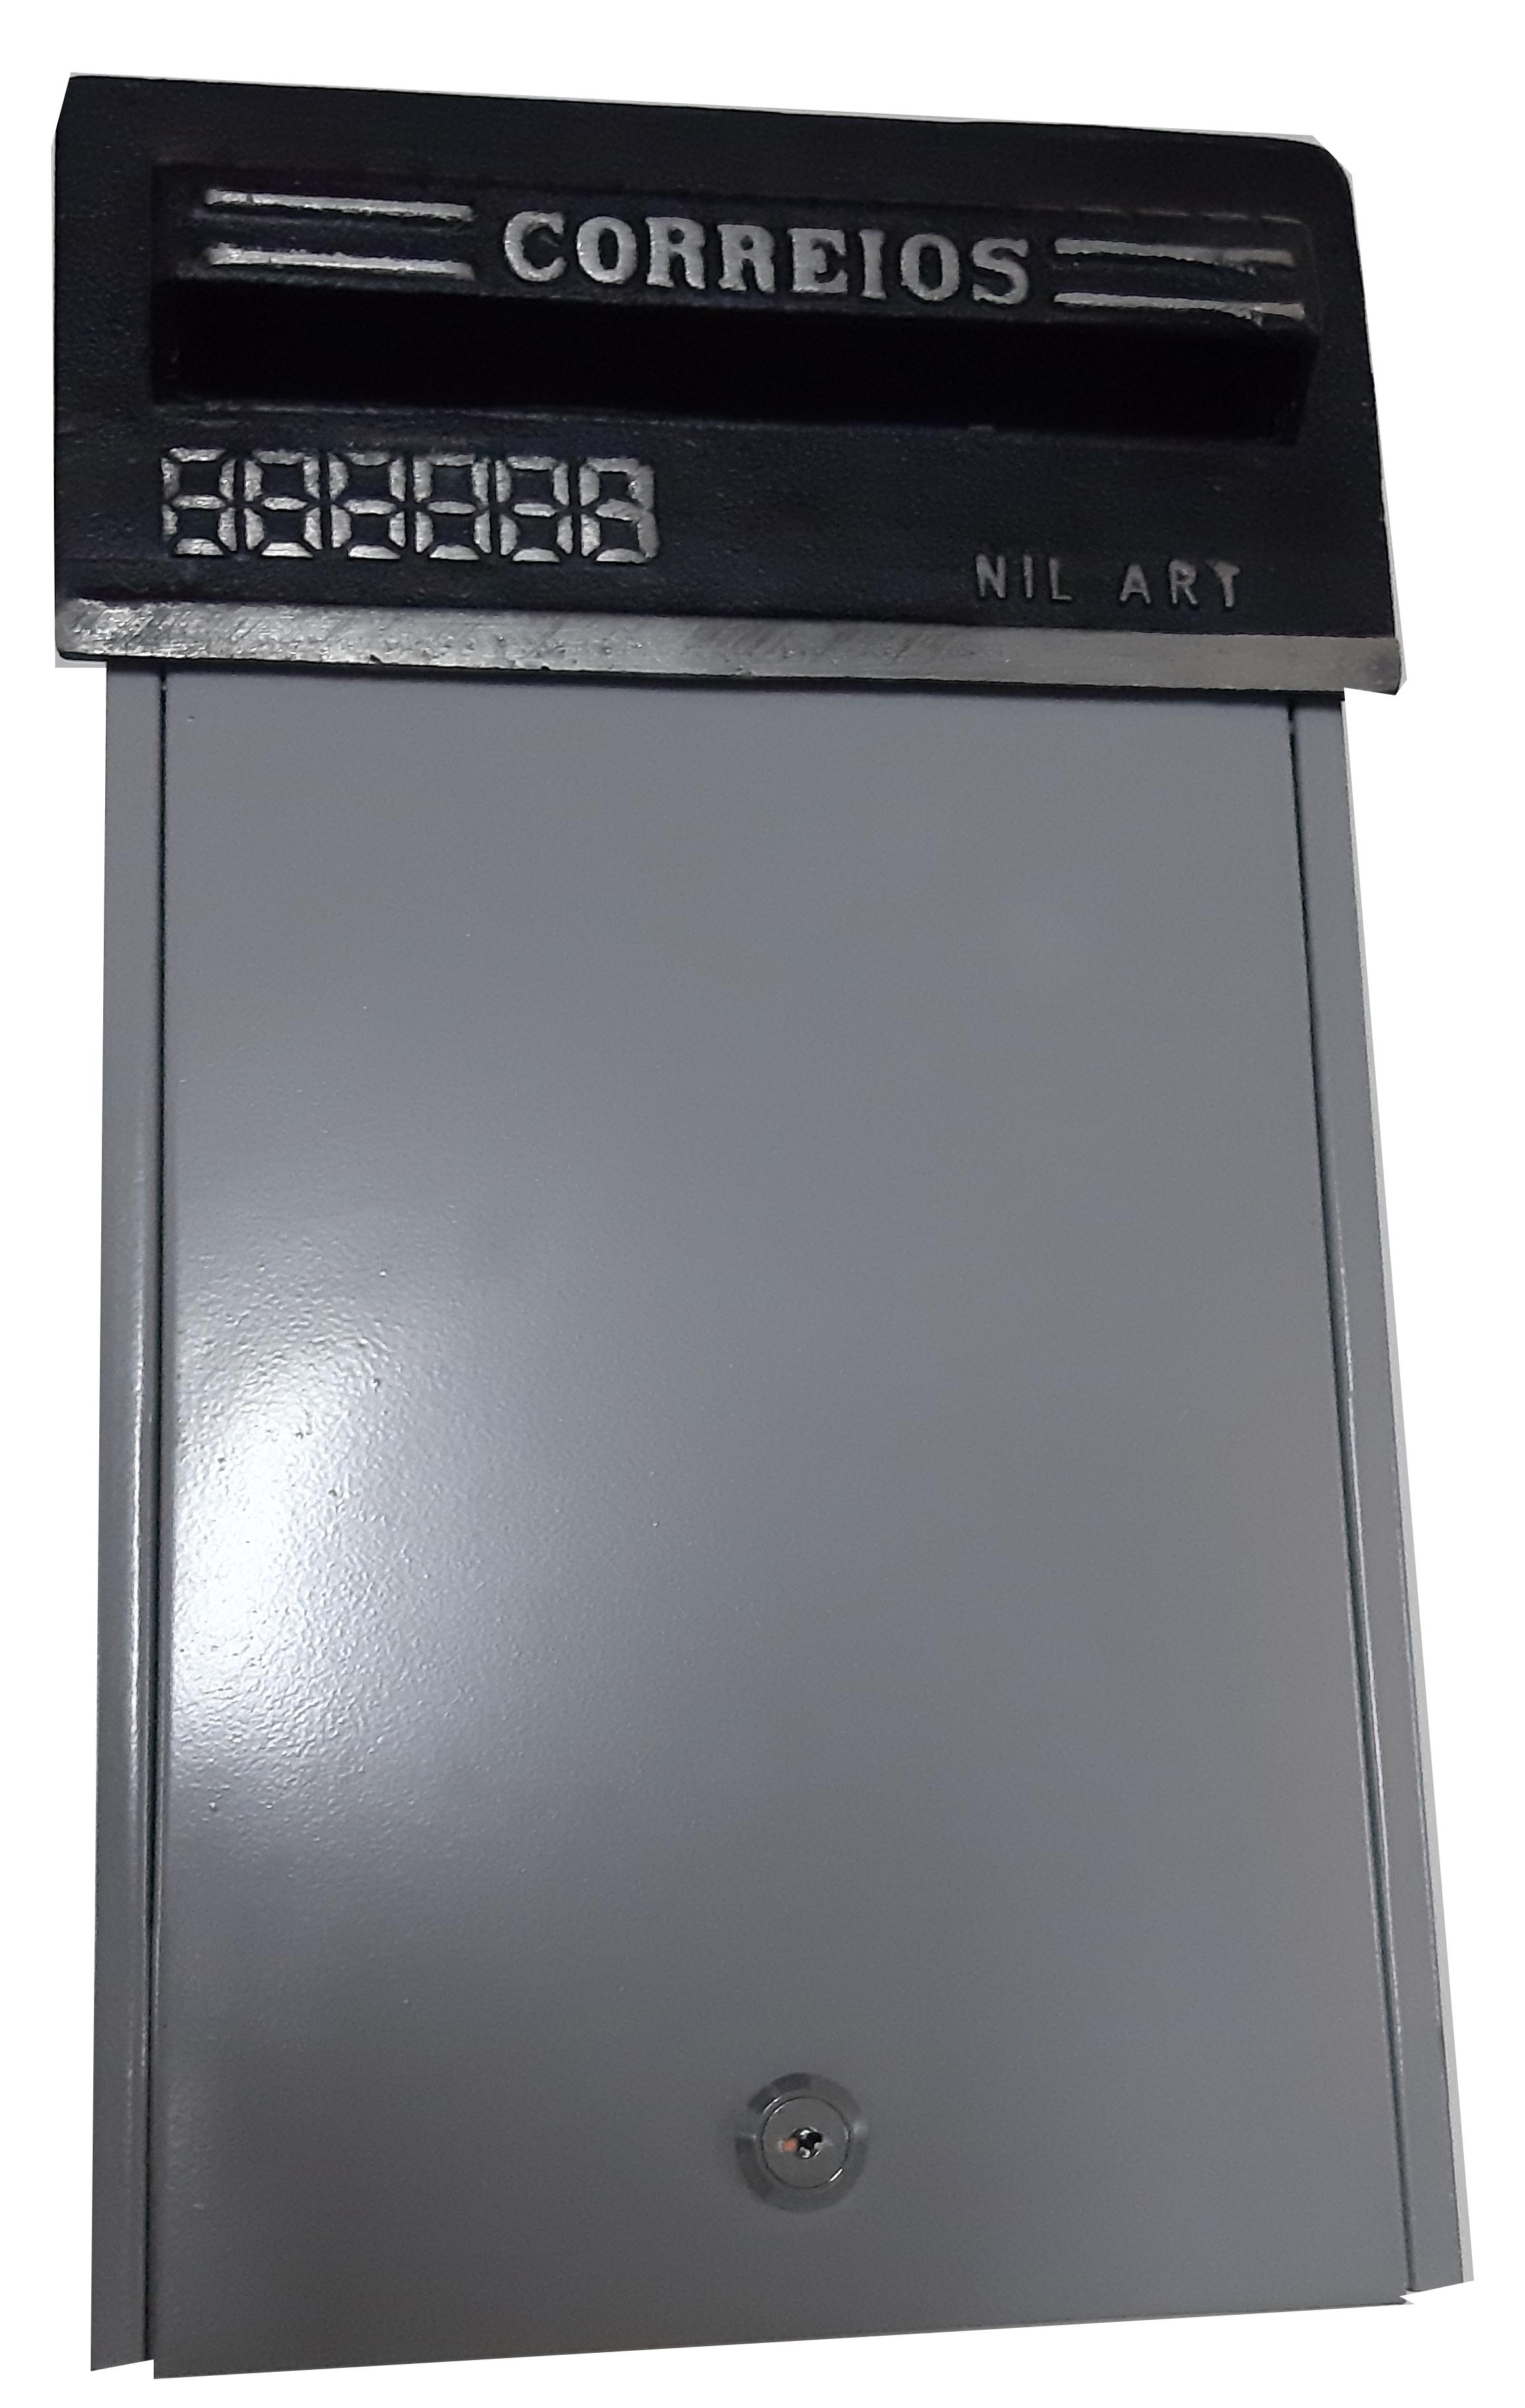 http://www.nilart.com.br/galeria/20190925_152736.jpg